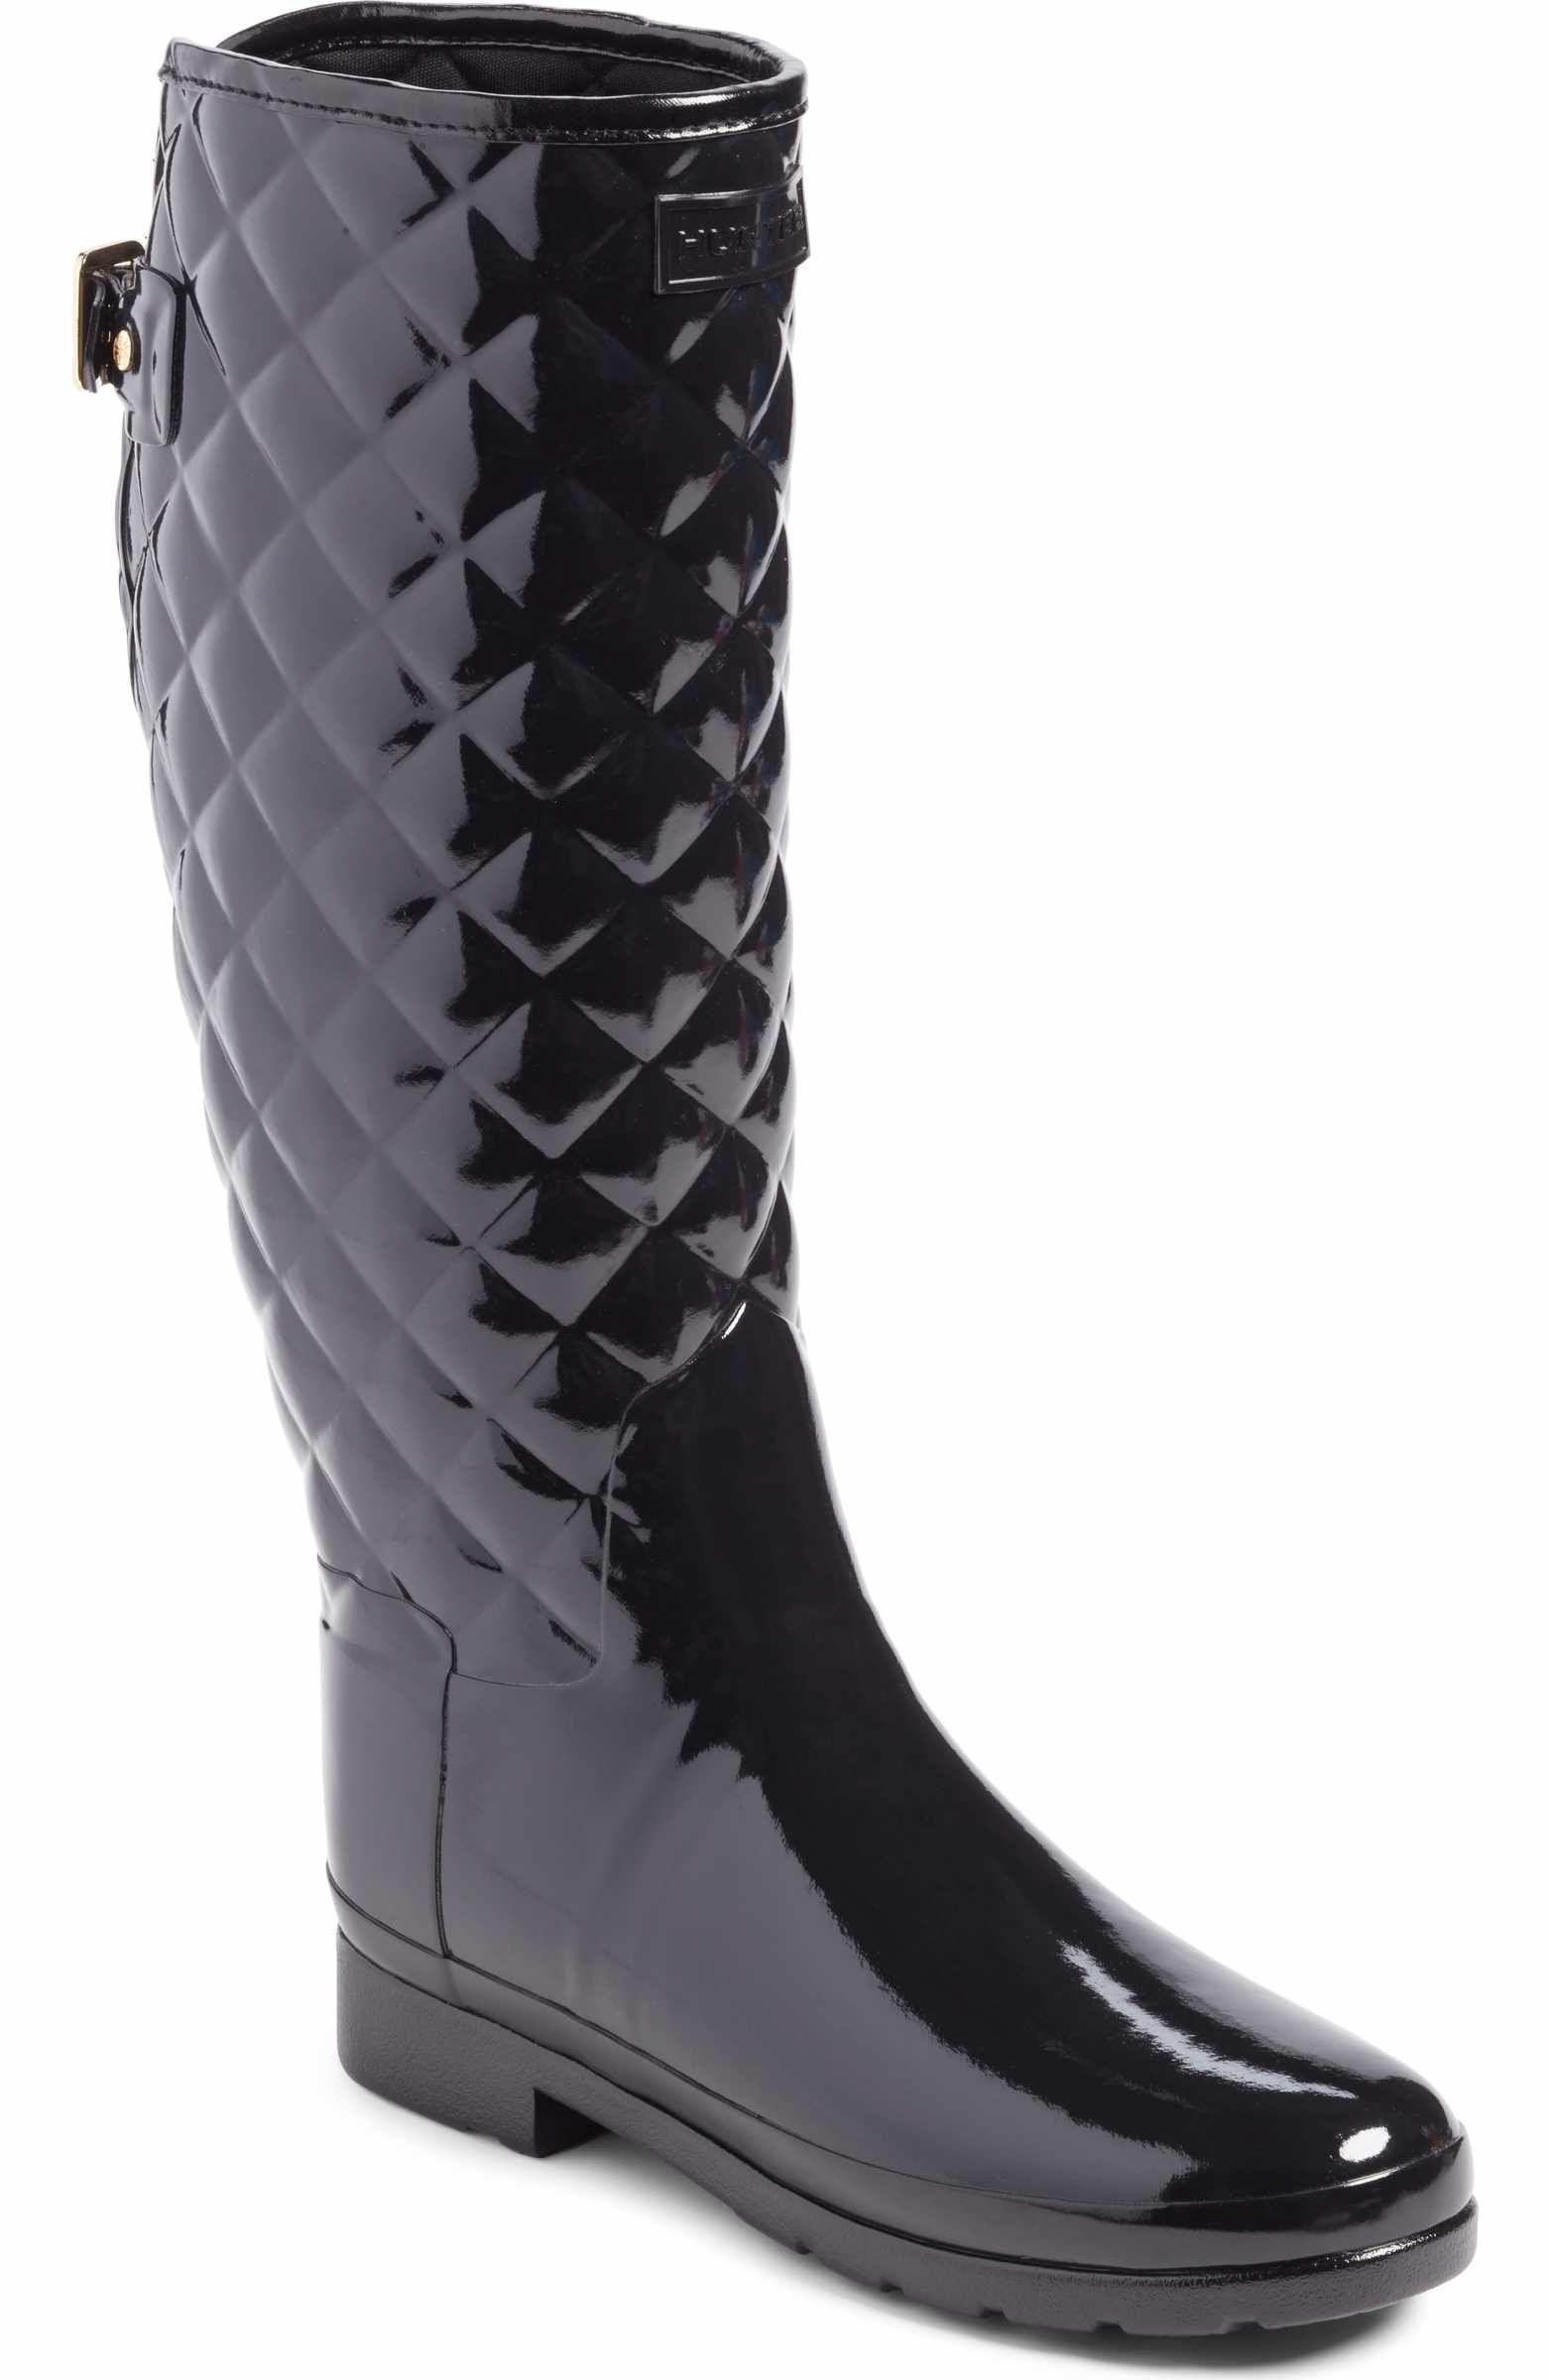 5e60bd89dabccc Main Image - Hunter Original Refined High Gloss Quilted Rain Boot (Women)